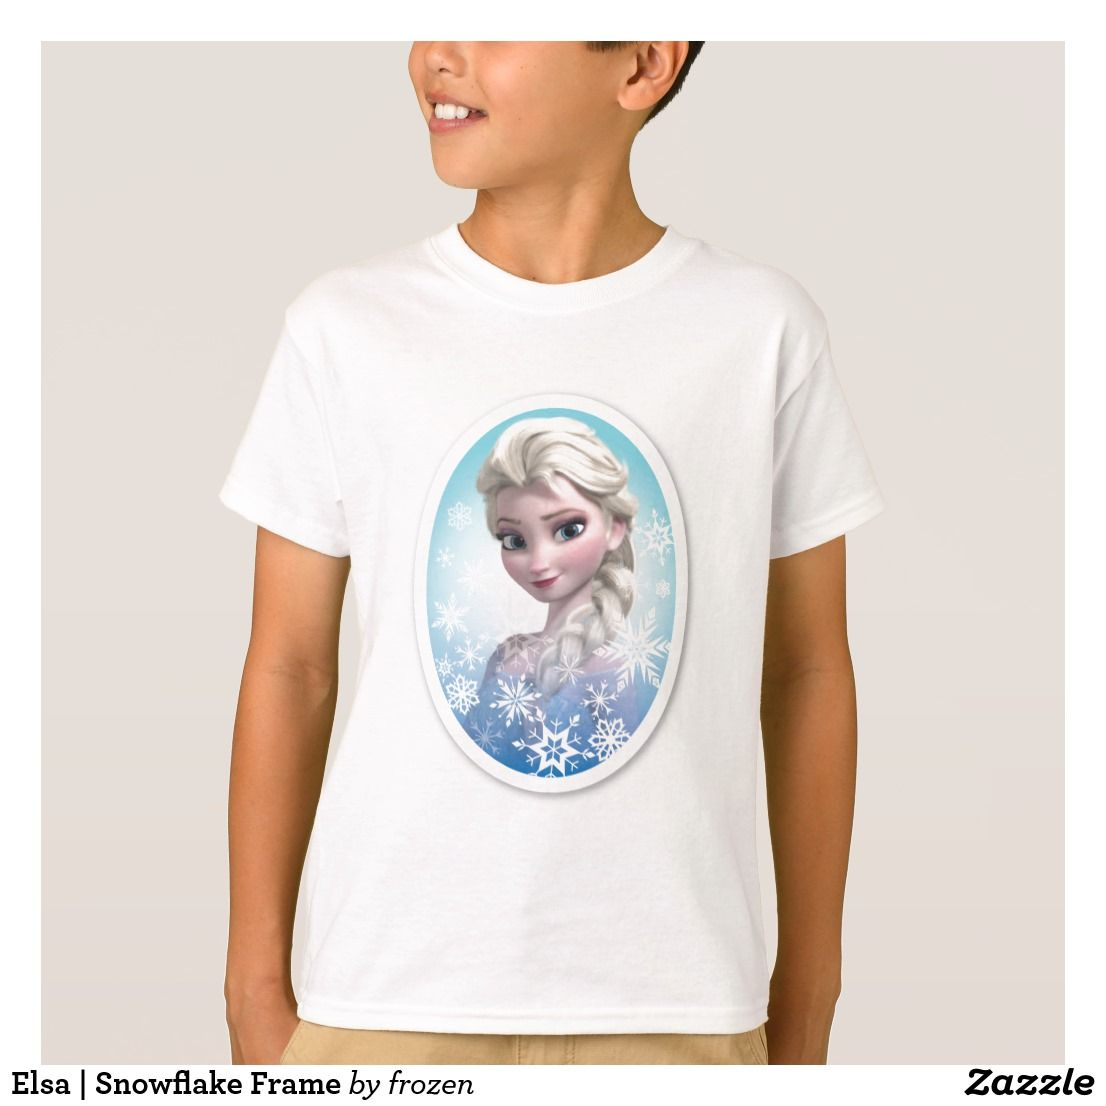 Elsa Snowflake Frame TShirt Cheap kids